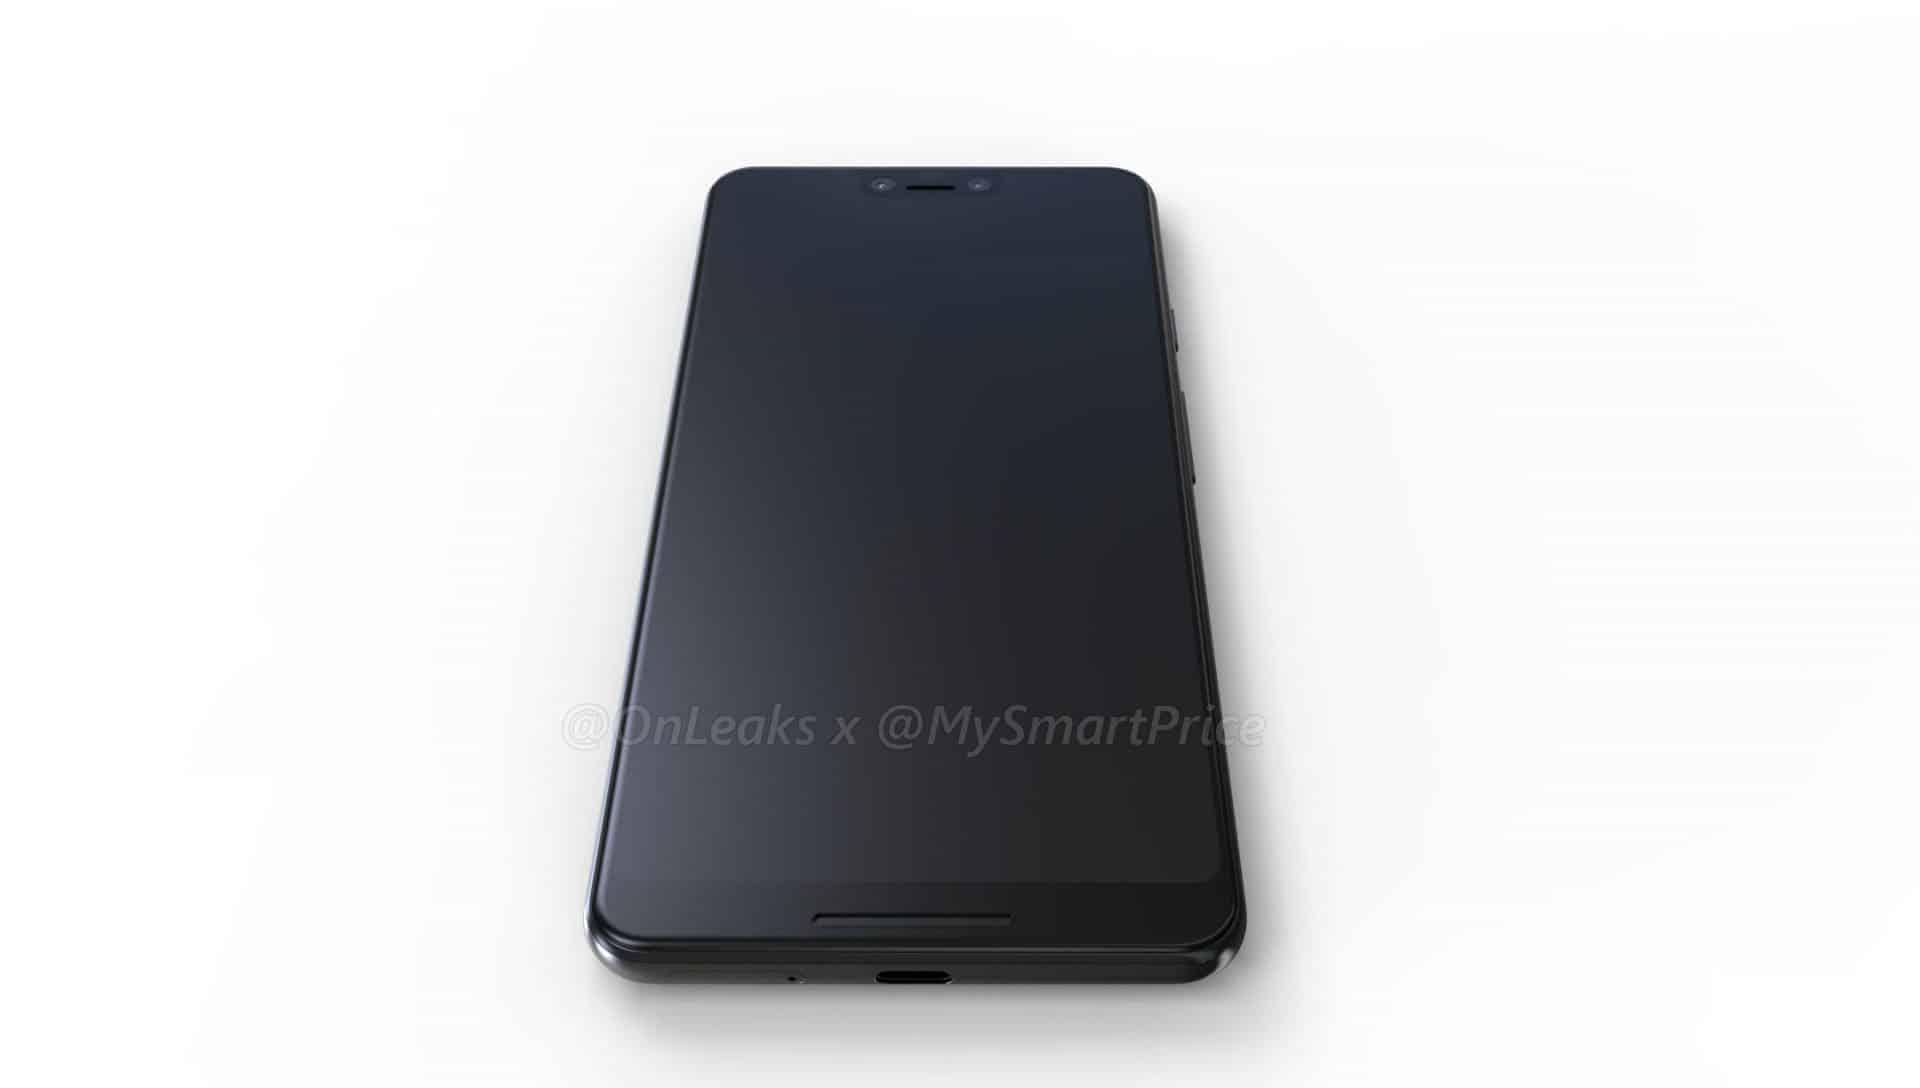 Google Pixel 3 XL MySmart Price 12